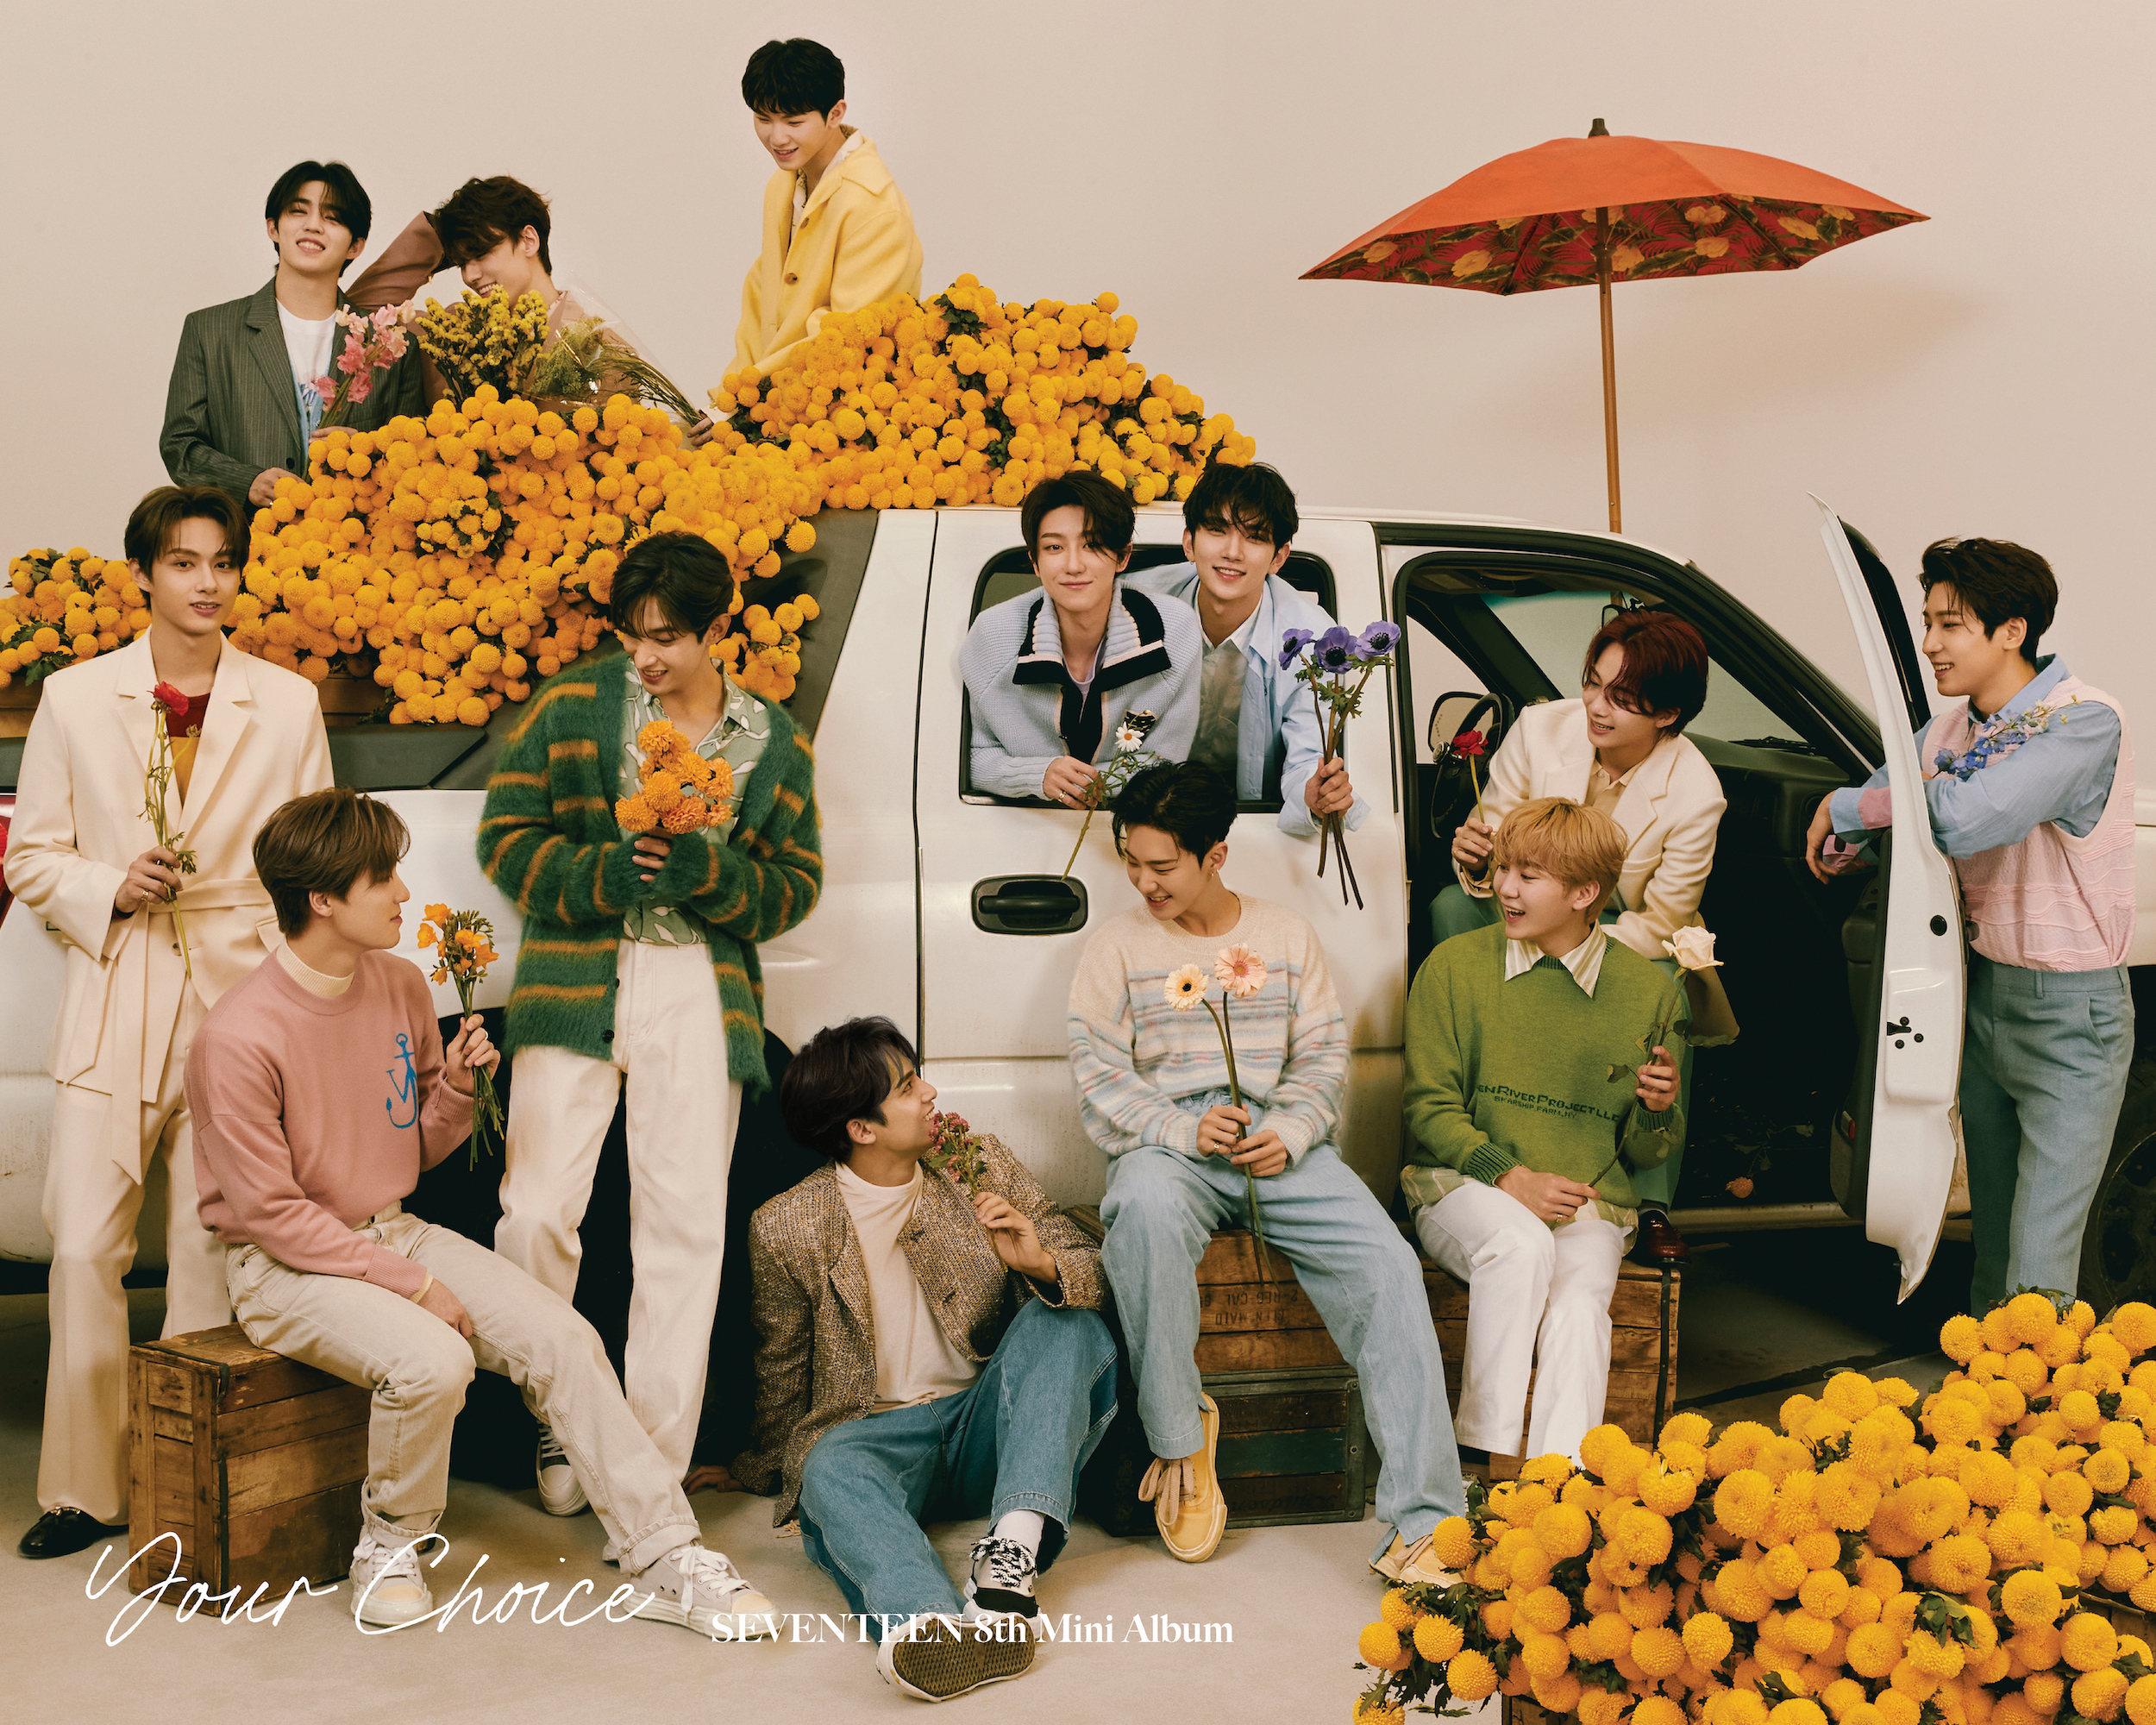 Seventeen Your Choice Teaser / Concept Photos (60 Photos, HD/HQ) - K-Pop  Database / dbkpop.com